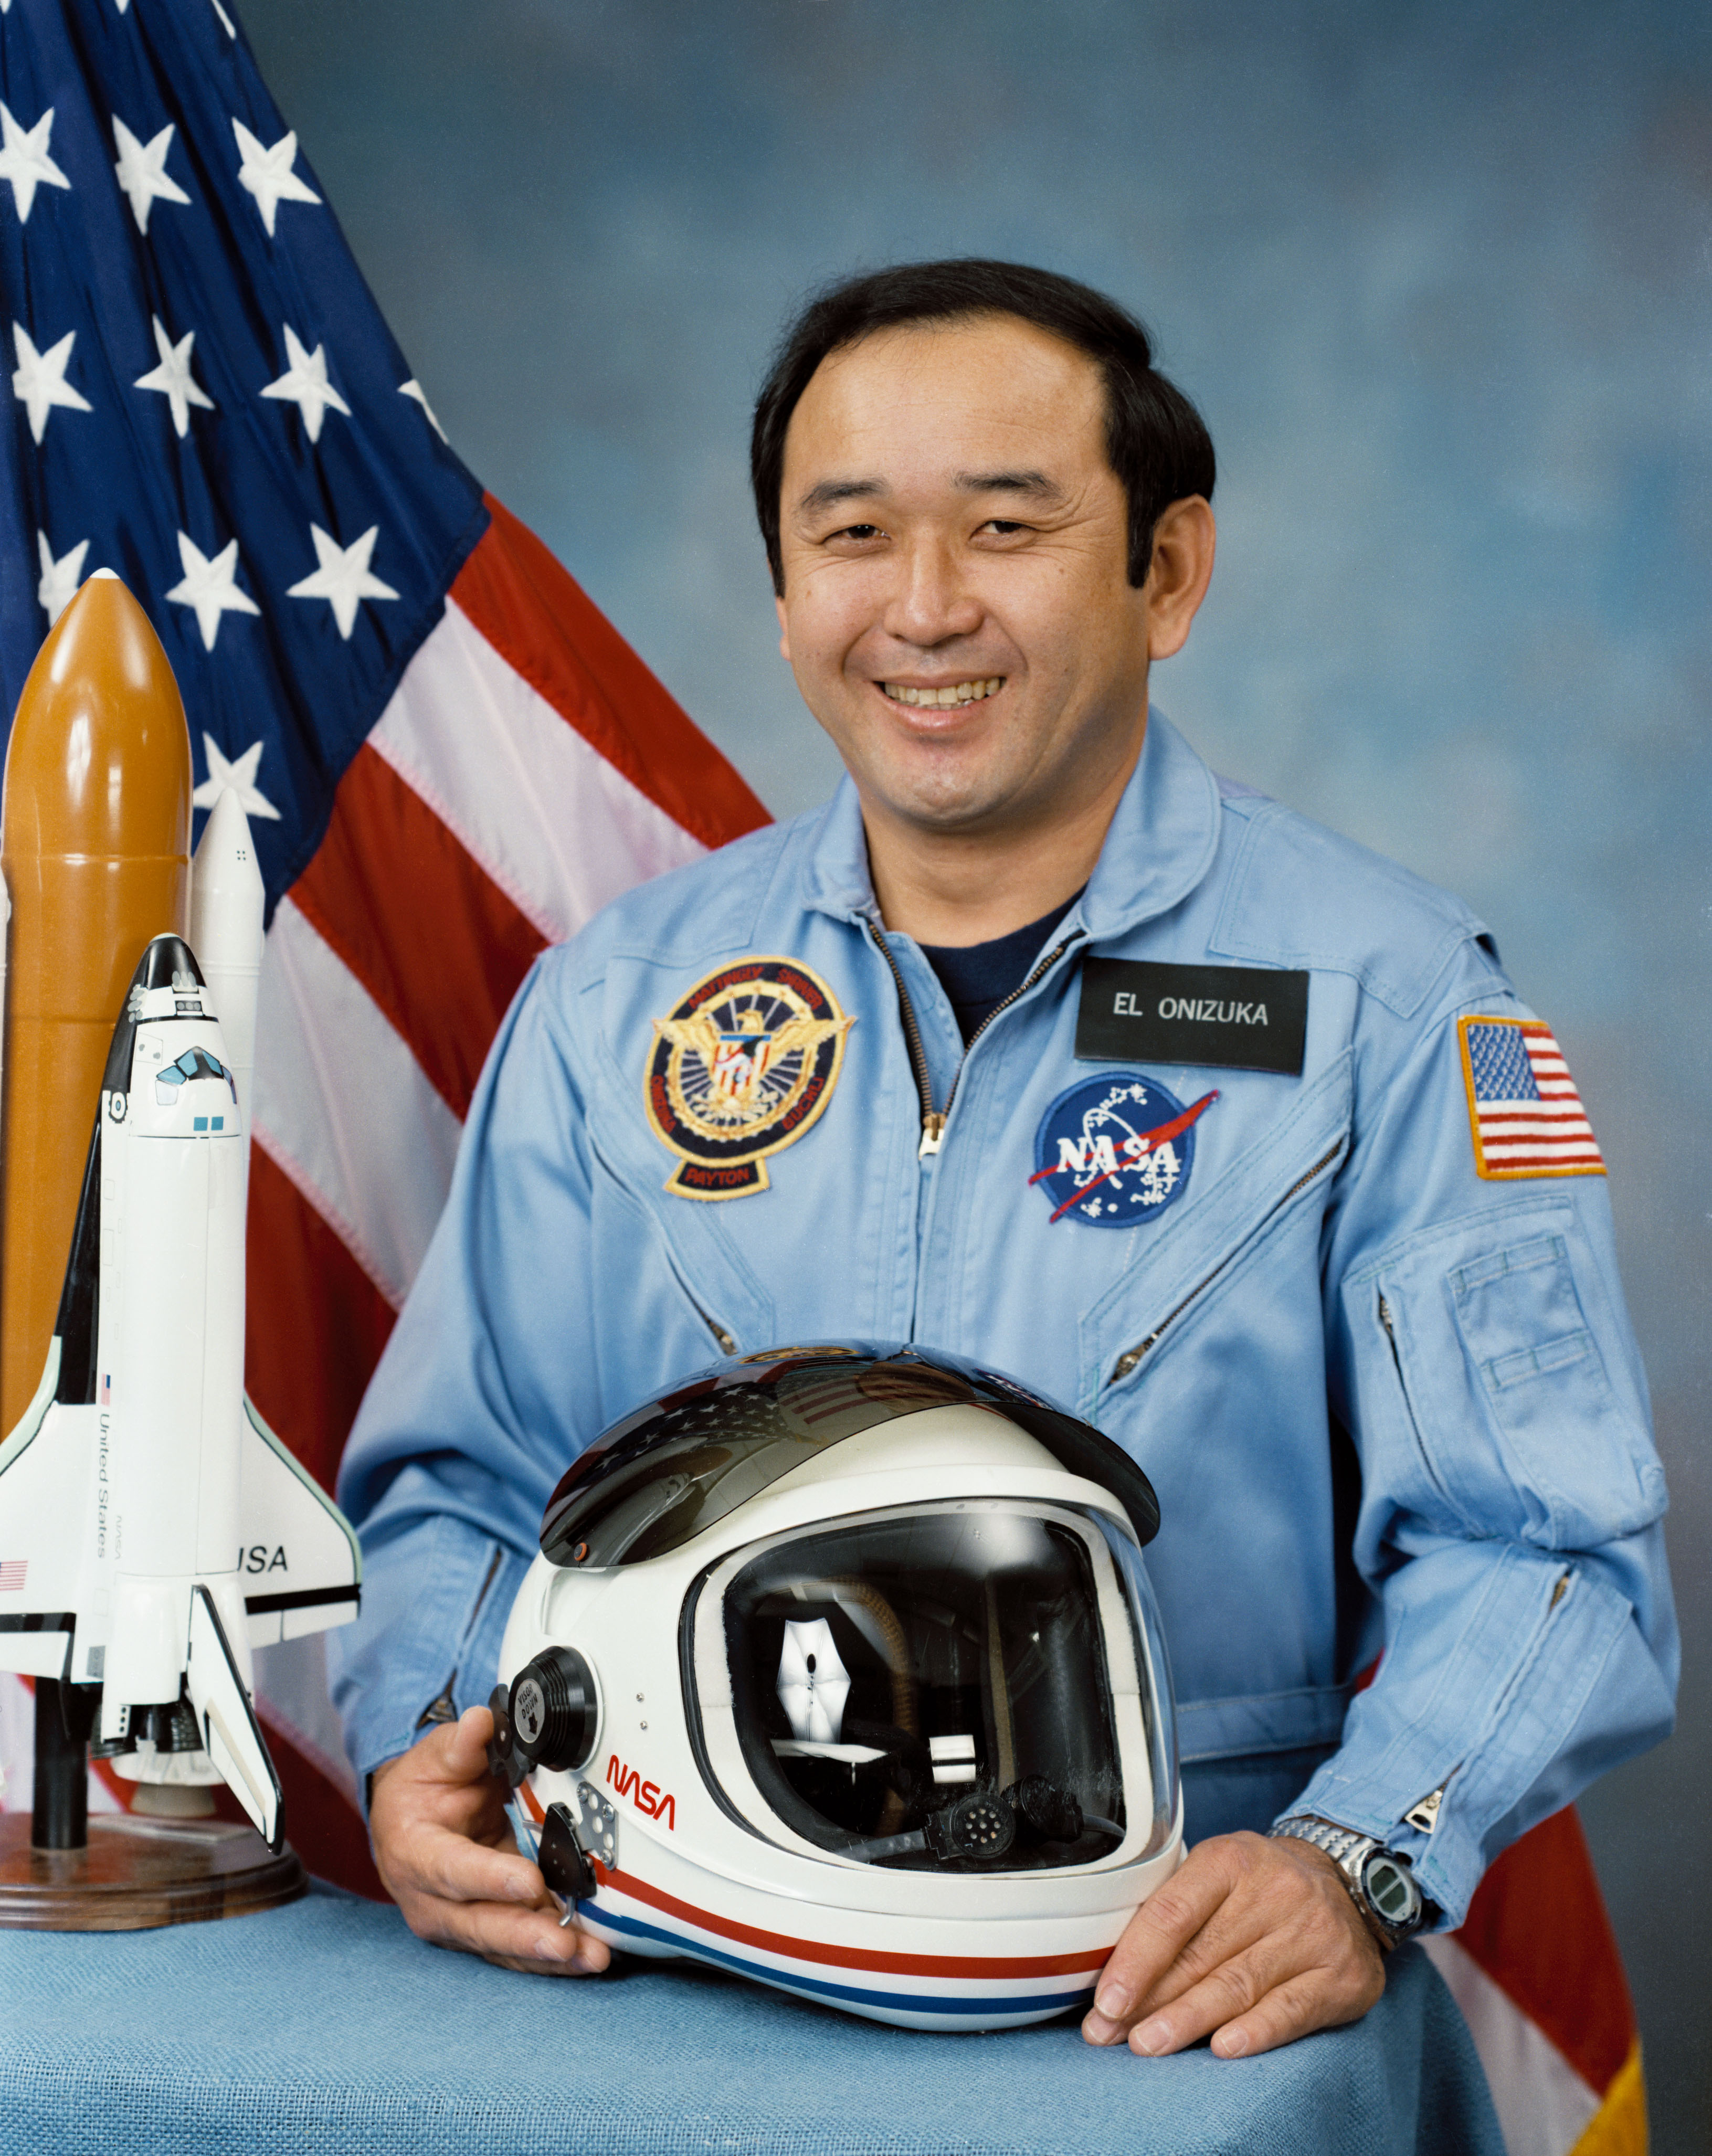 oldest original astronaut - photo #40